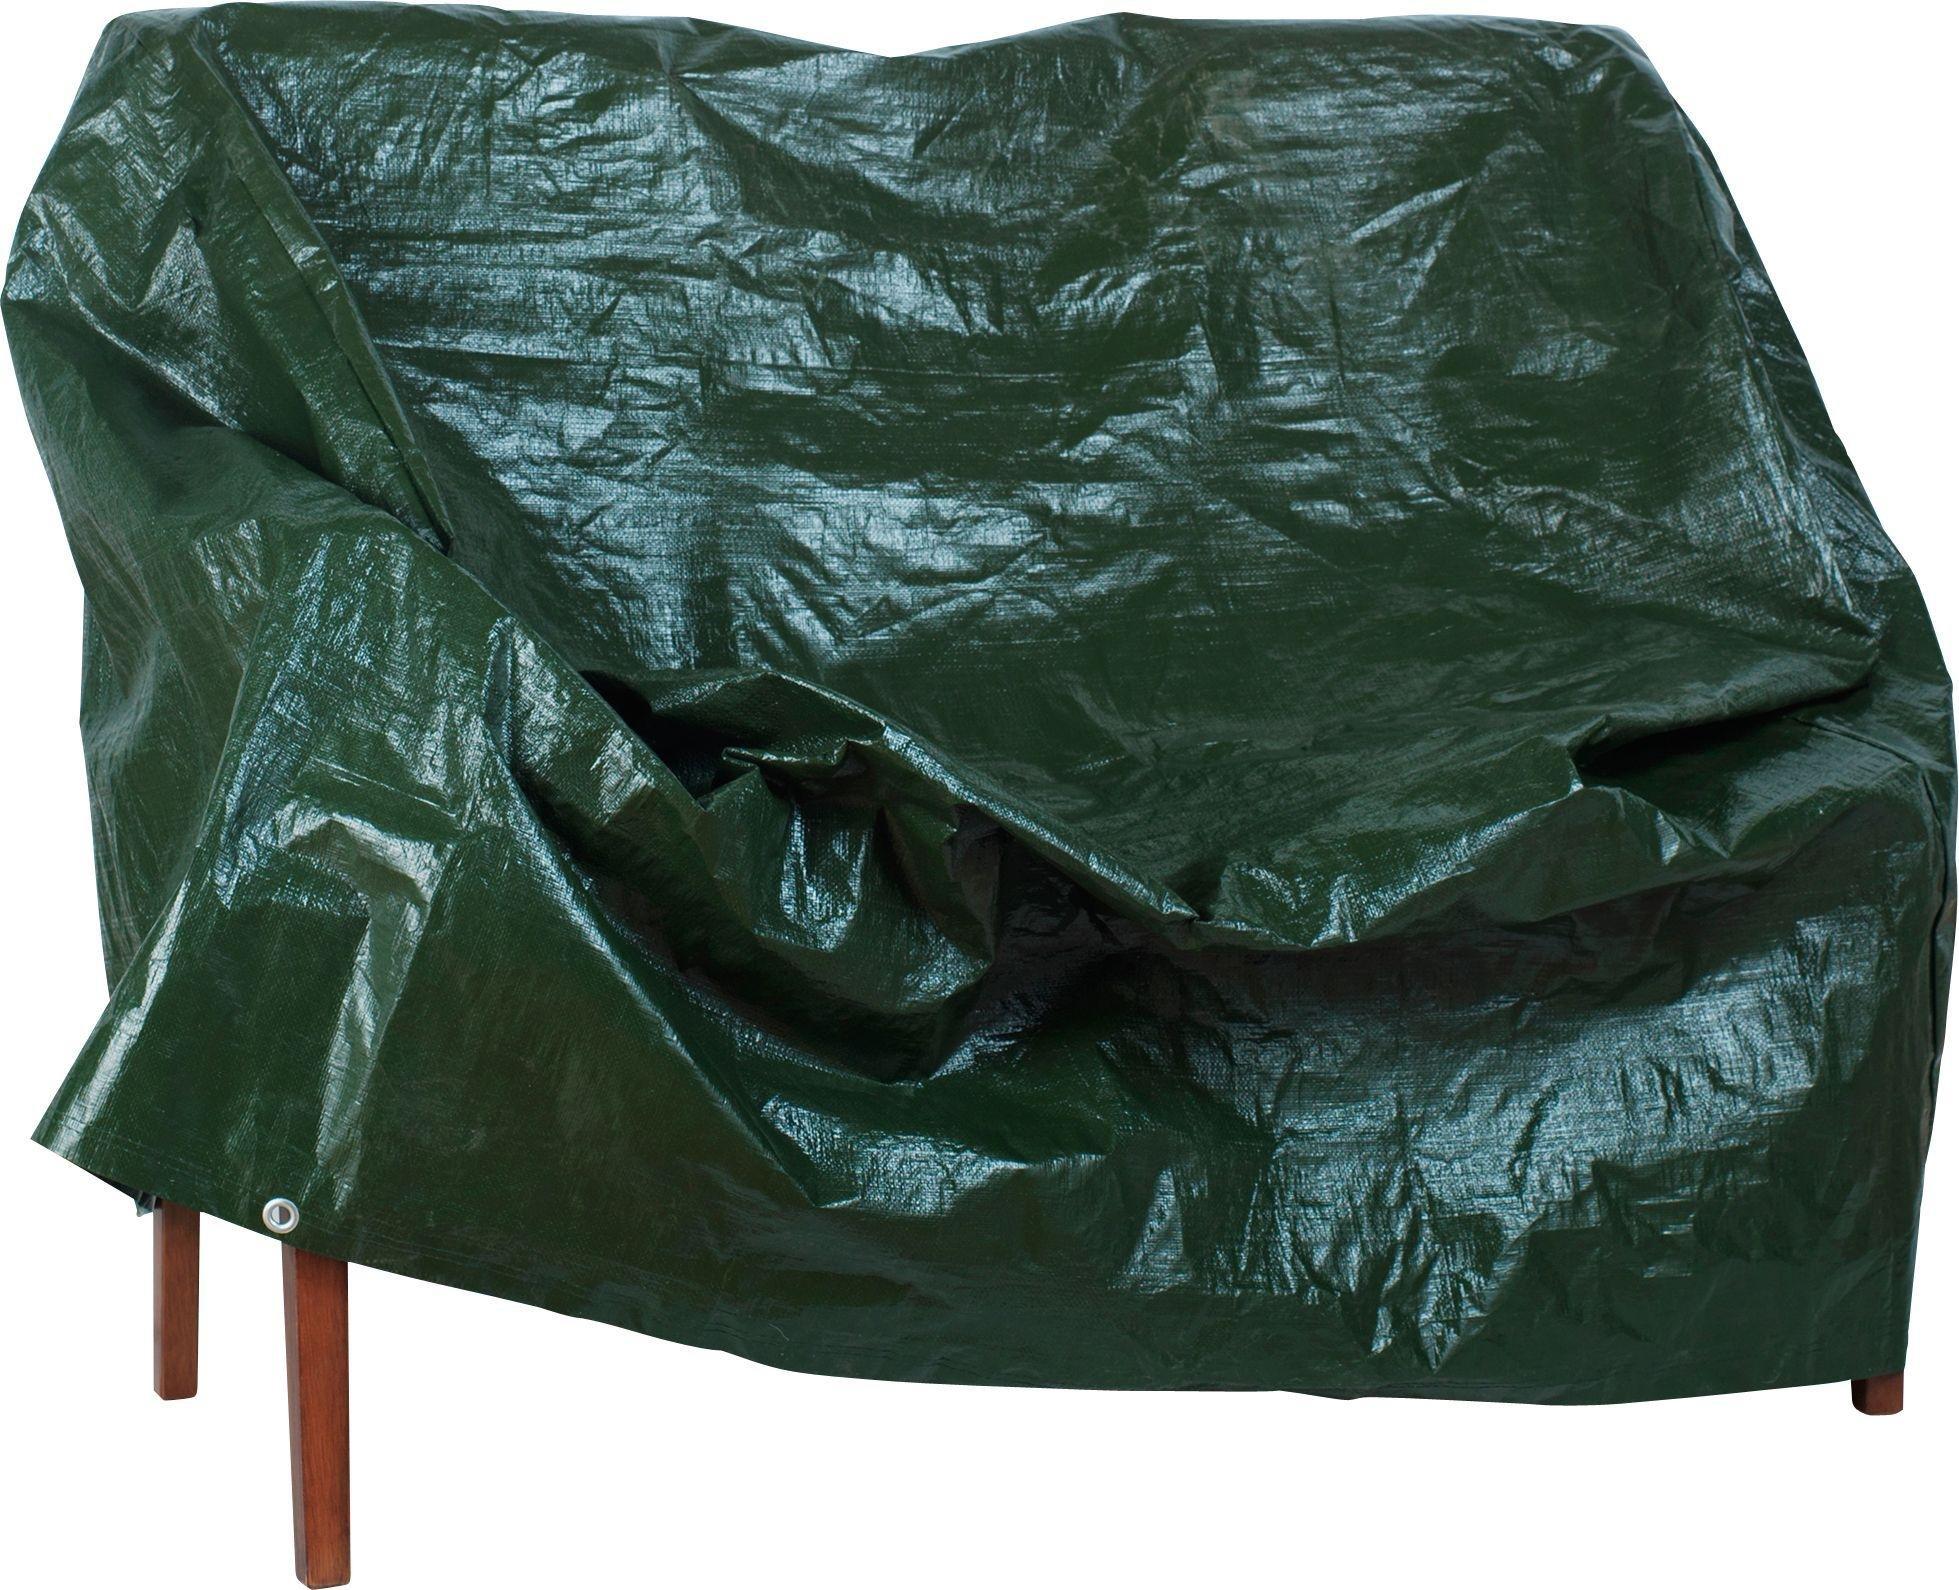 Argos Home - 4ft Heavy Duty Plastic - Garden Bench Cover